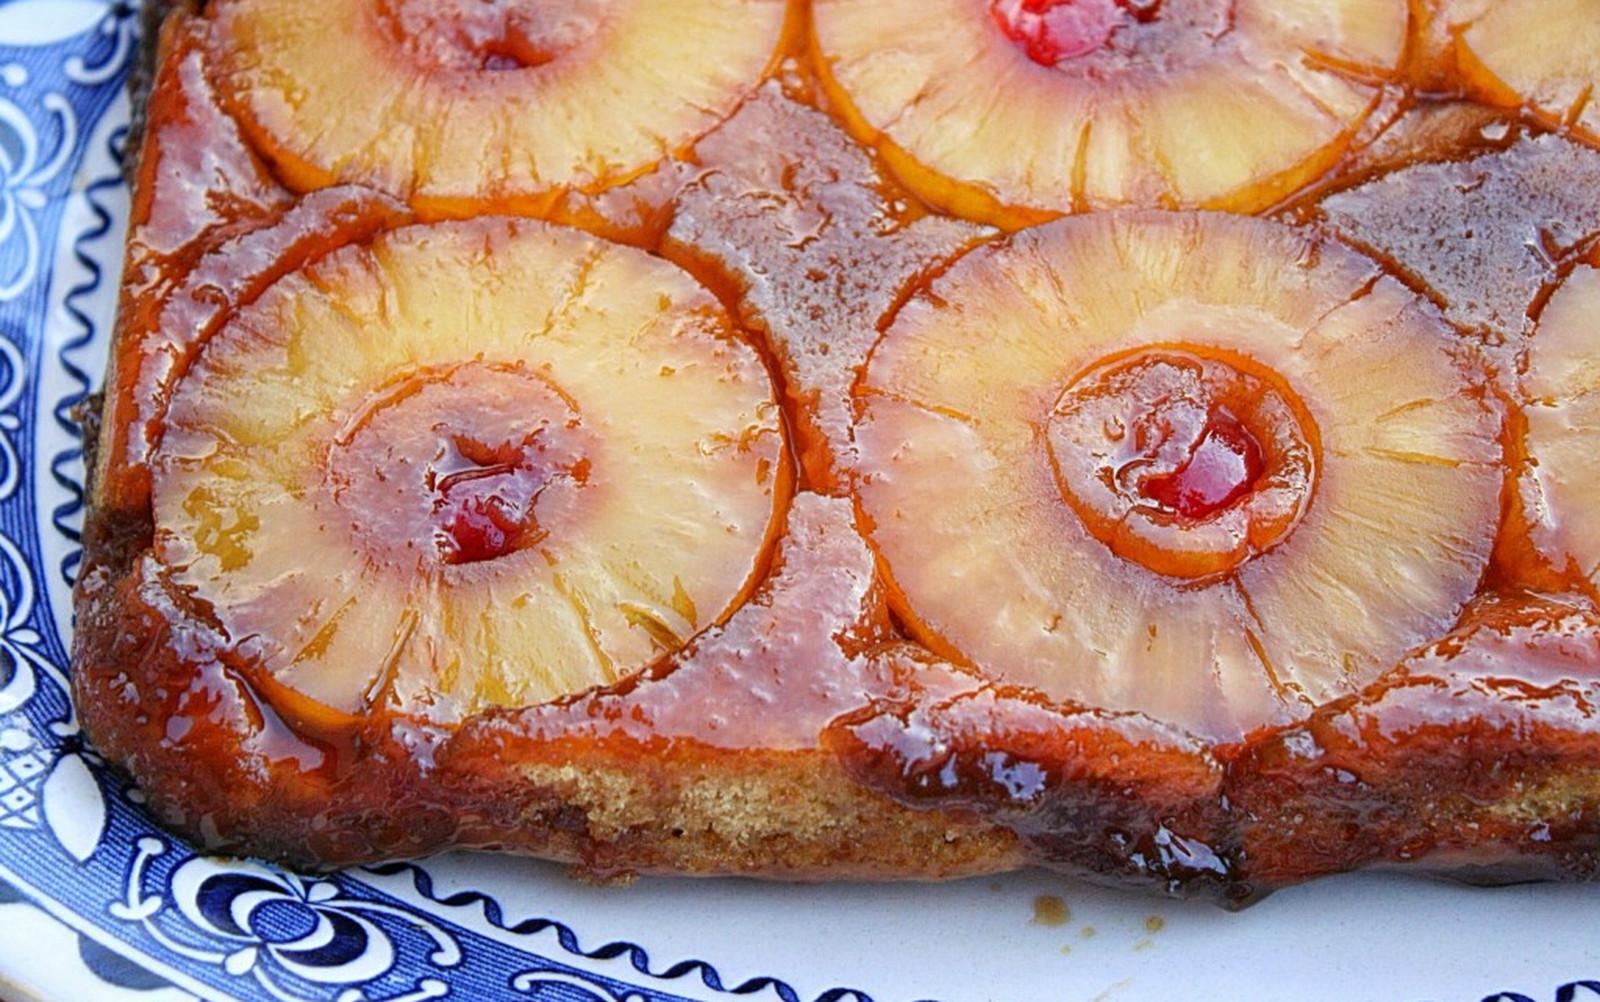 Vintage Pineapple Upside-Down Cake